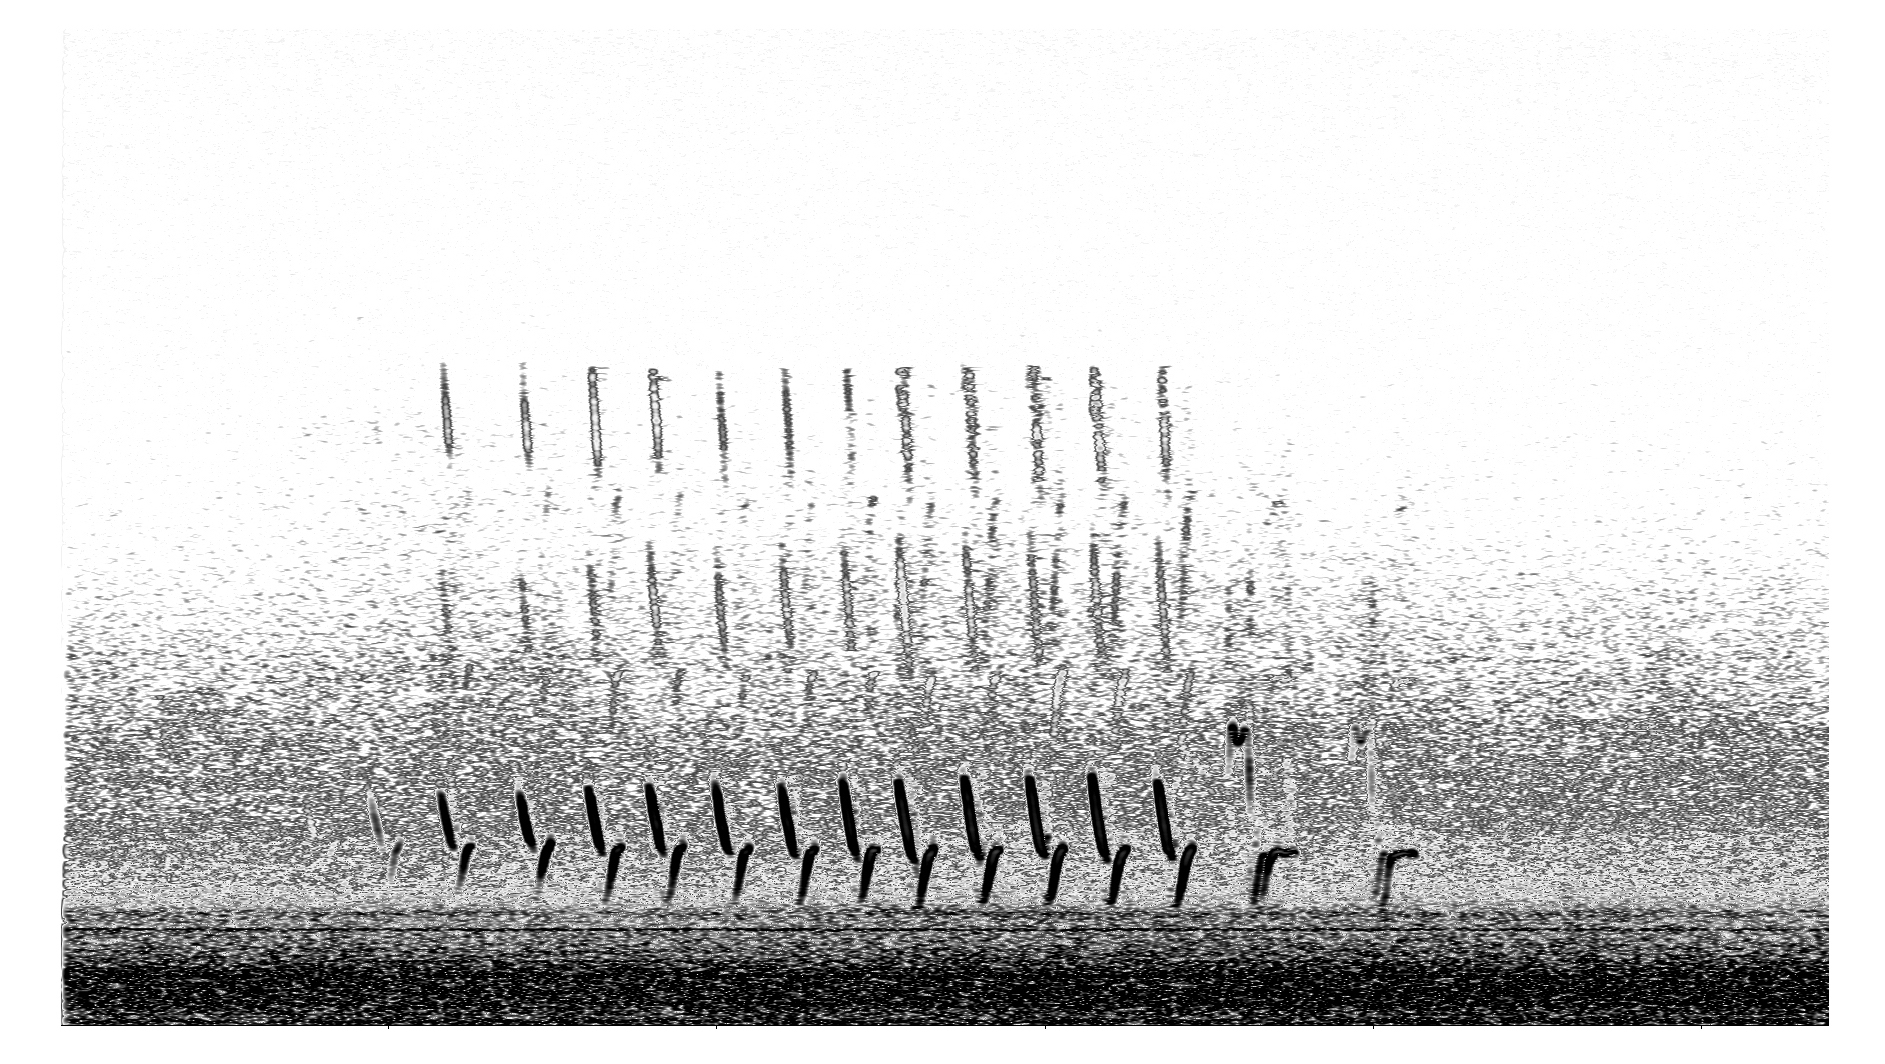 K.r.m. Mooney   Spectrogram II , 2018, Spectrogram, 6 x 3 ⅛ inches